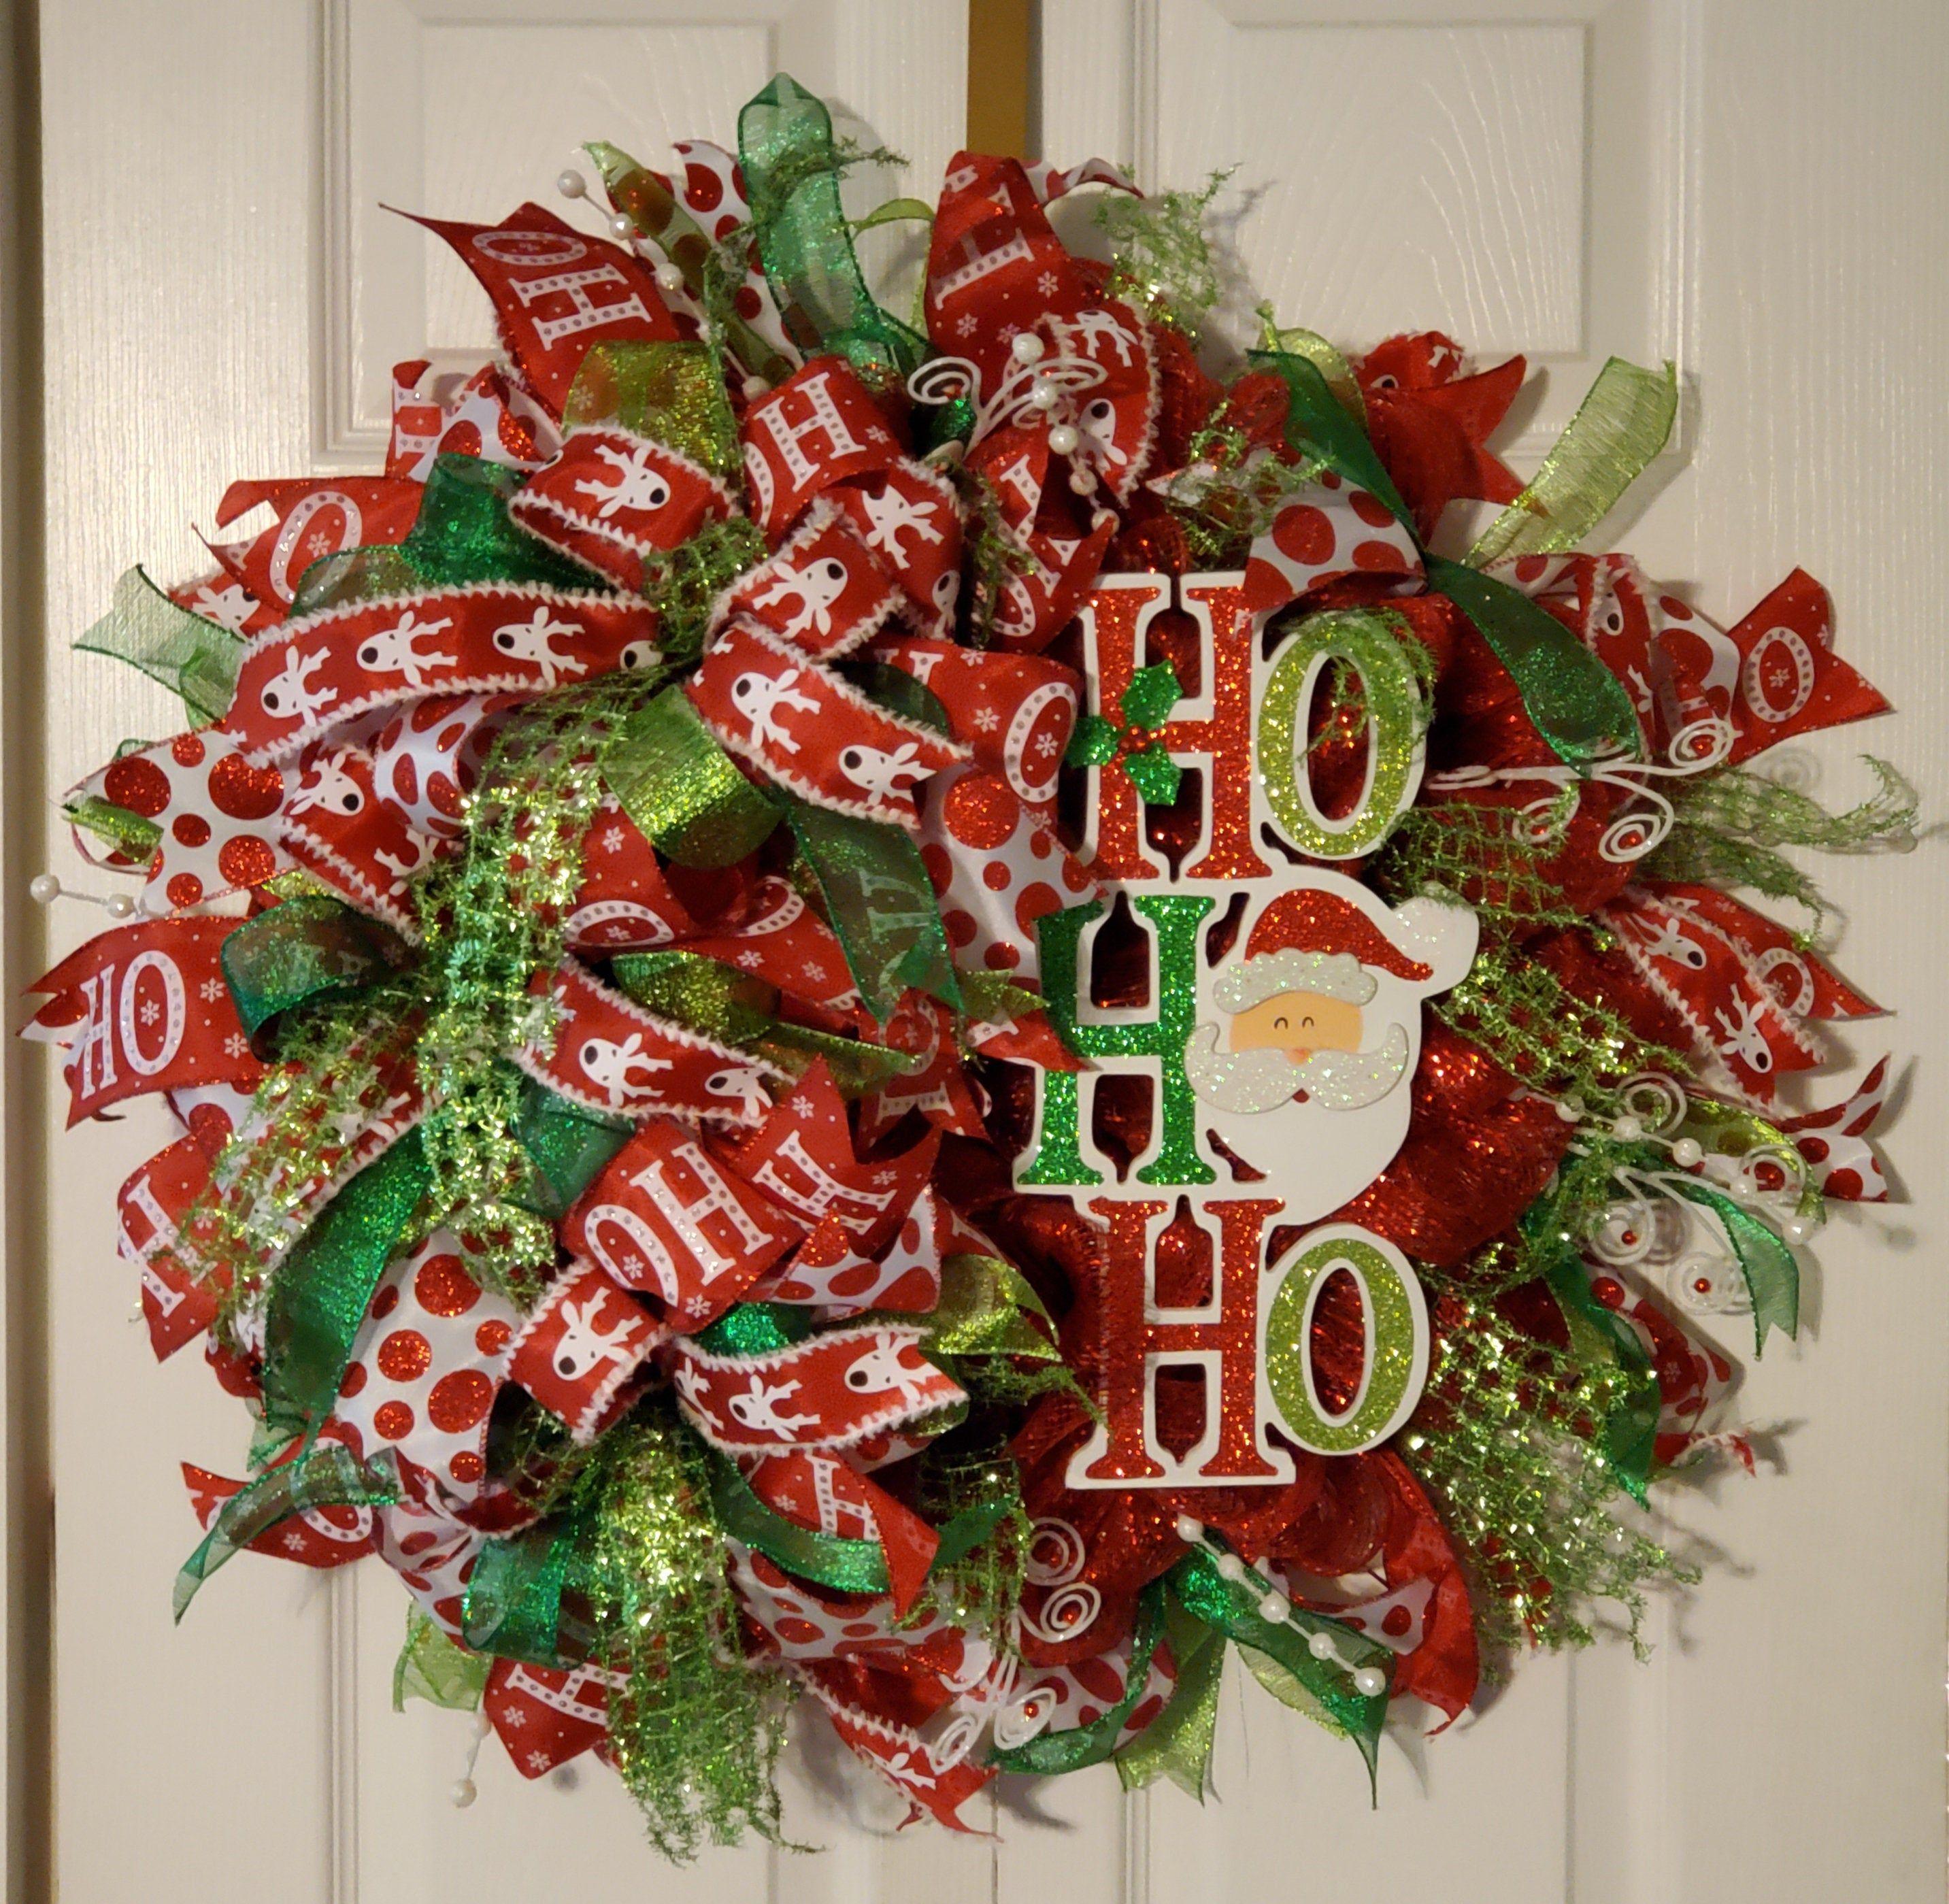 Christmas Wreath For Front Door Christmas Deco Mesh Wreath Etsy In 2020 Deco Mesh Christmas Wreaths Christmas Wreaths Christmas Door Decorations